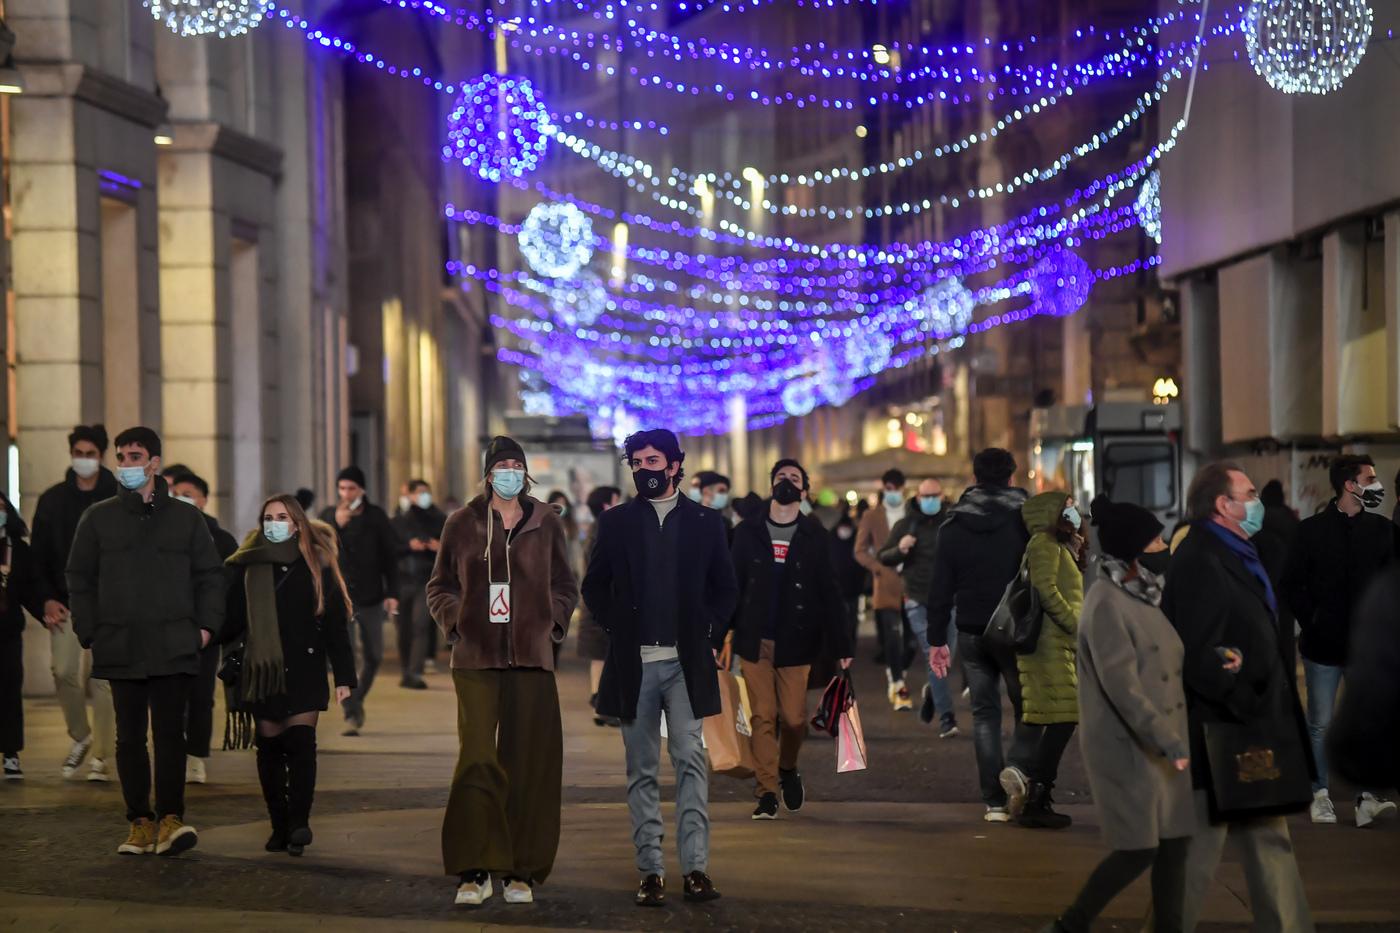 Milano, vetrine dei negozi e luminarie natalizie nel centro città